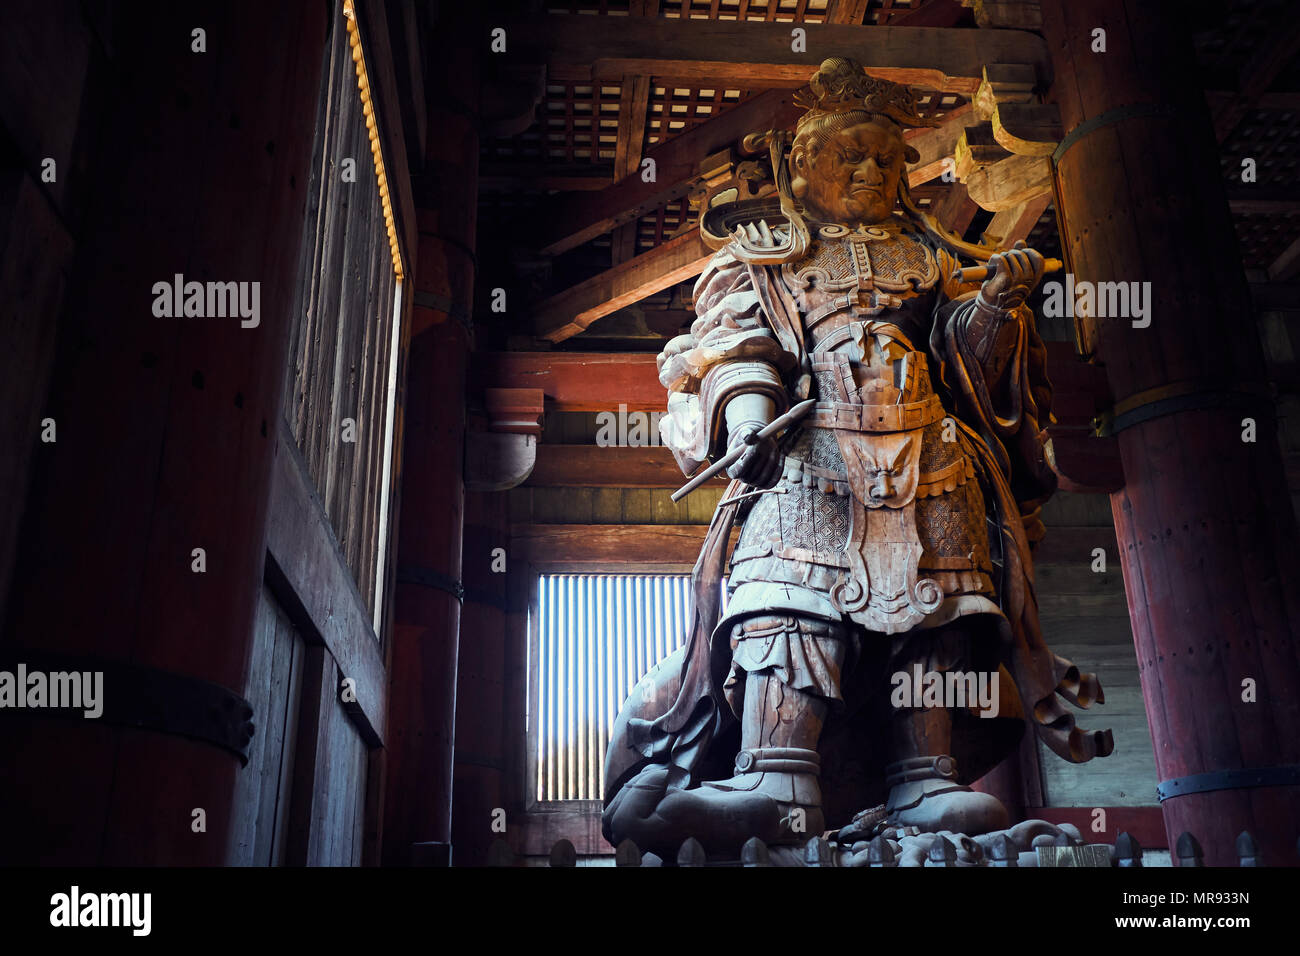 Komokuten inside Todai-ji in Nara, Japan - Stock Image